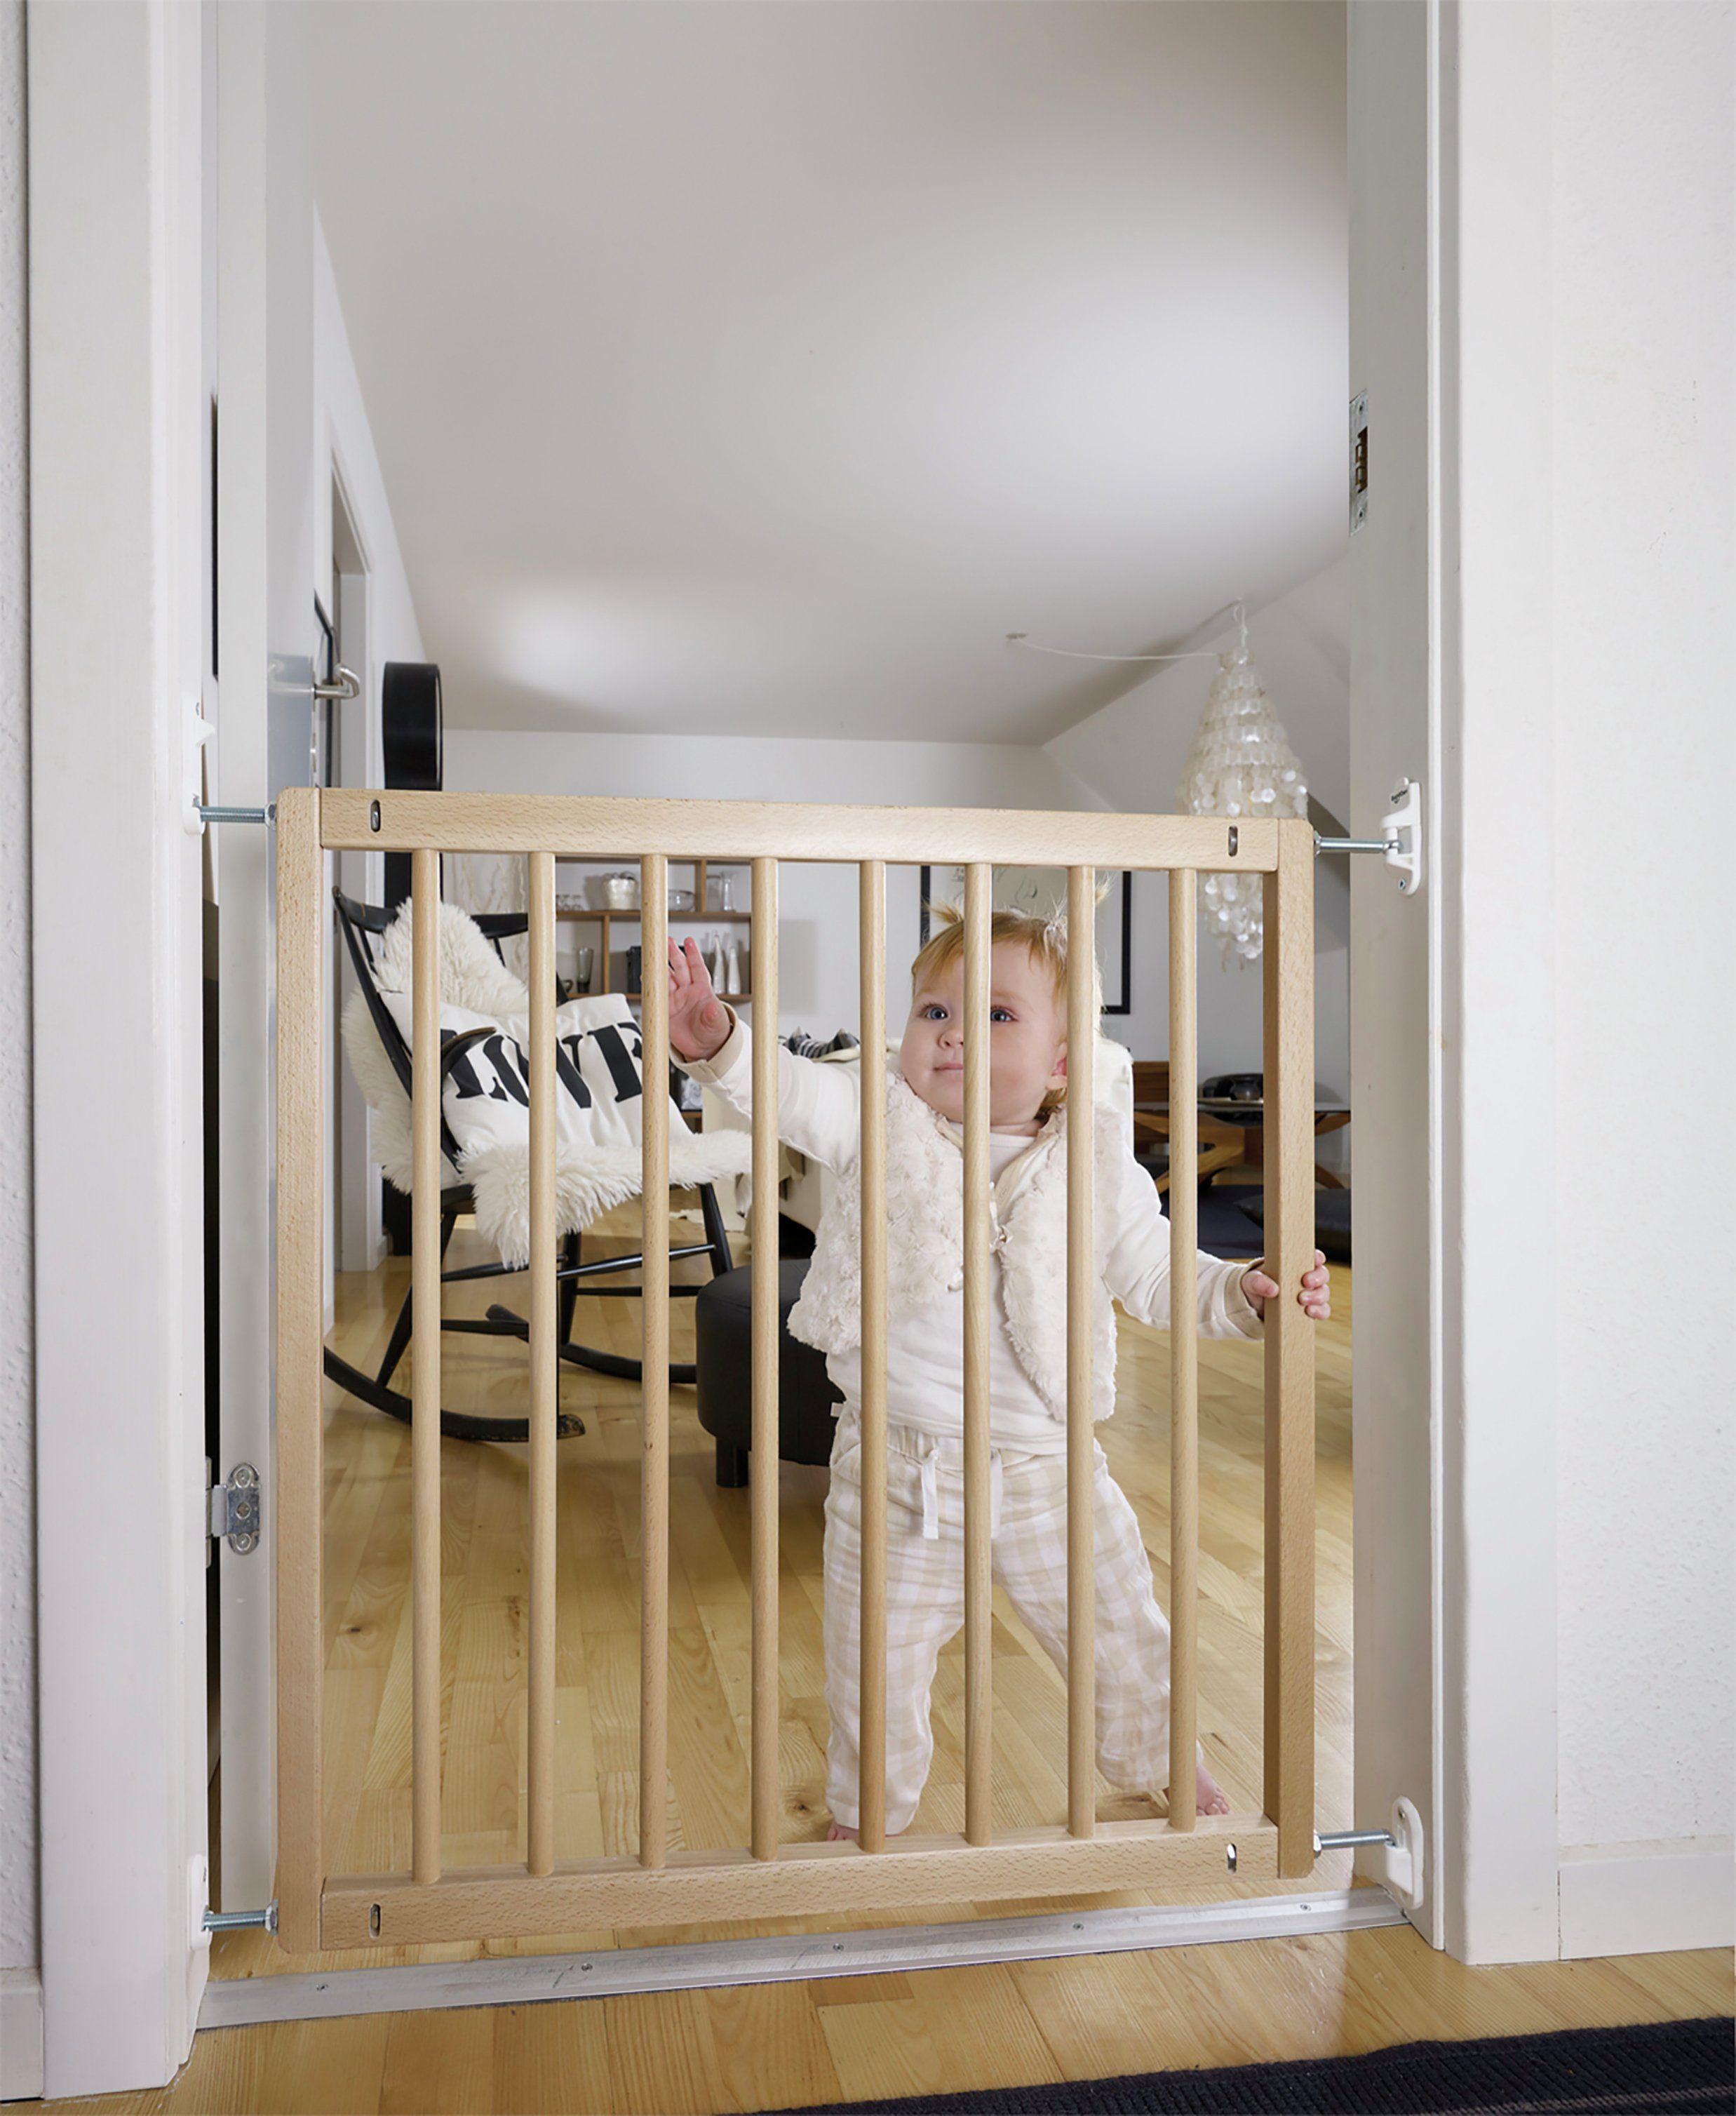 Buy BabyDan Narrow Beechwood Safety Gate Safety gates in